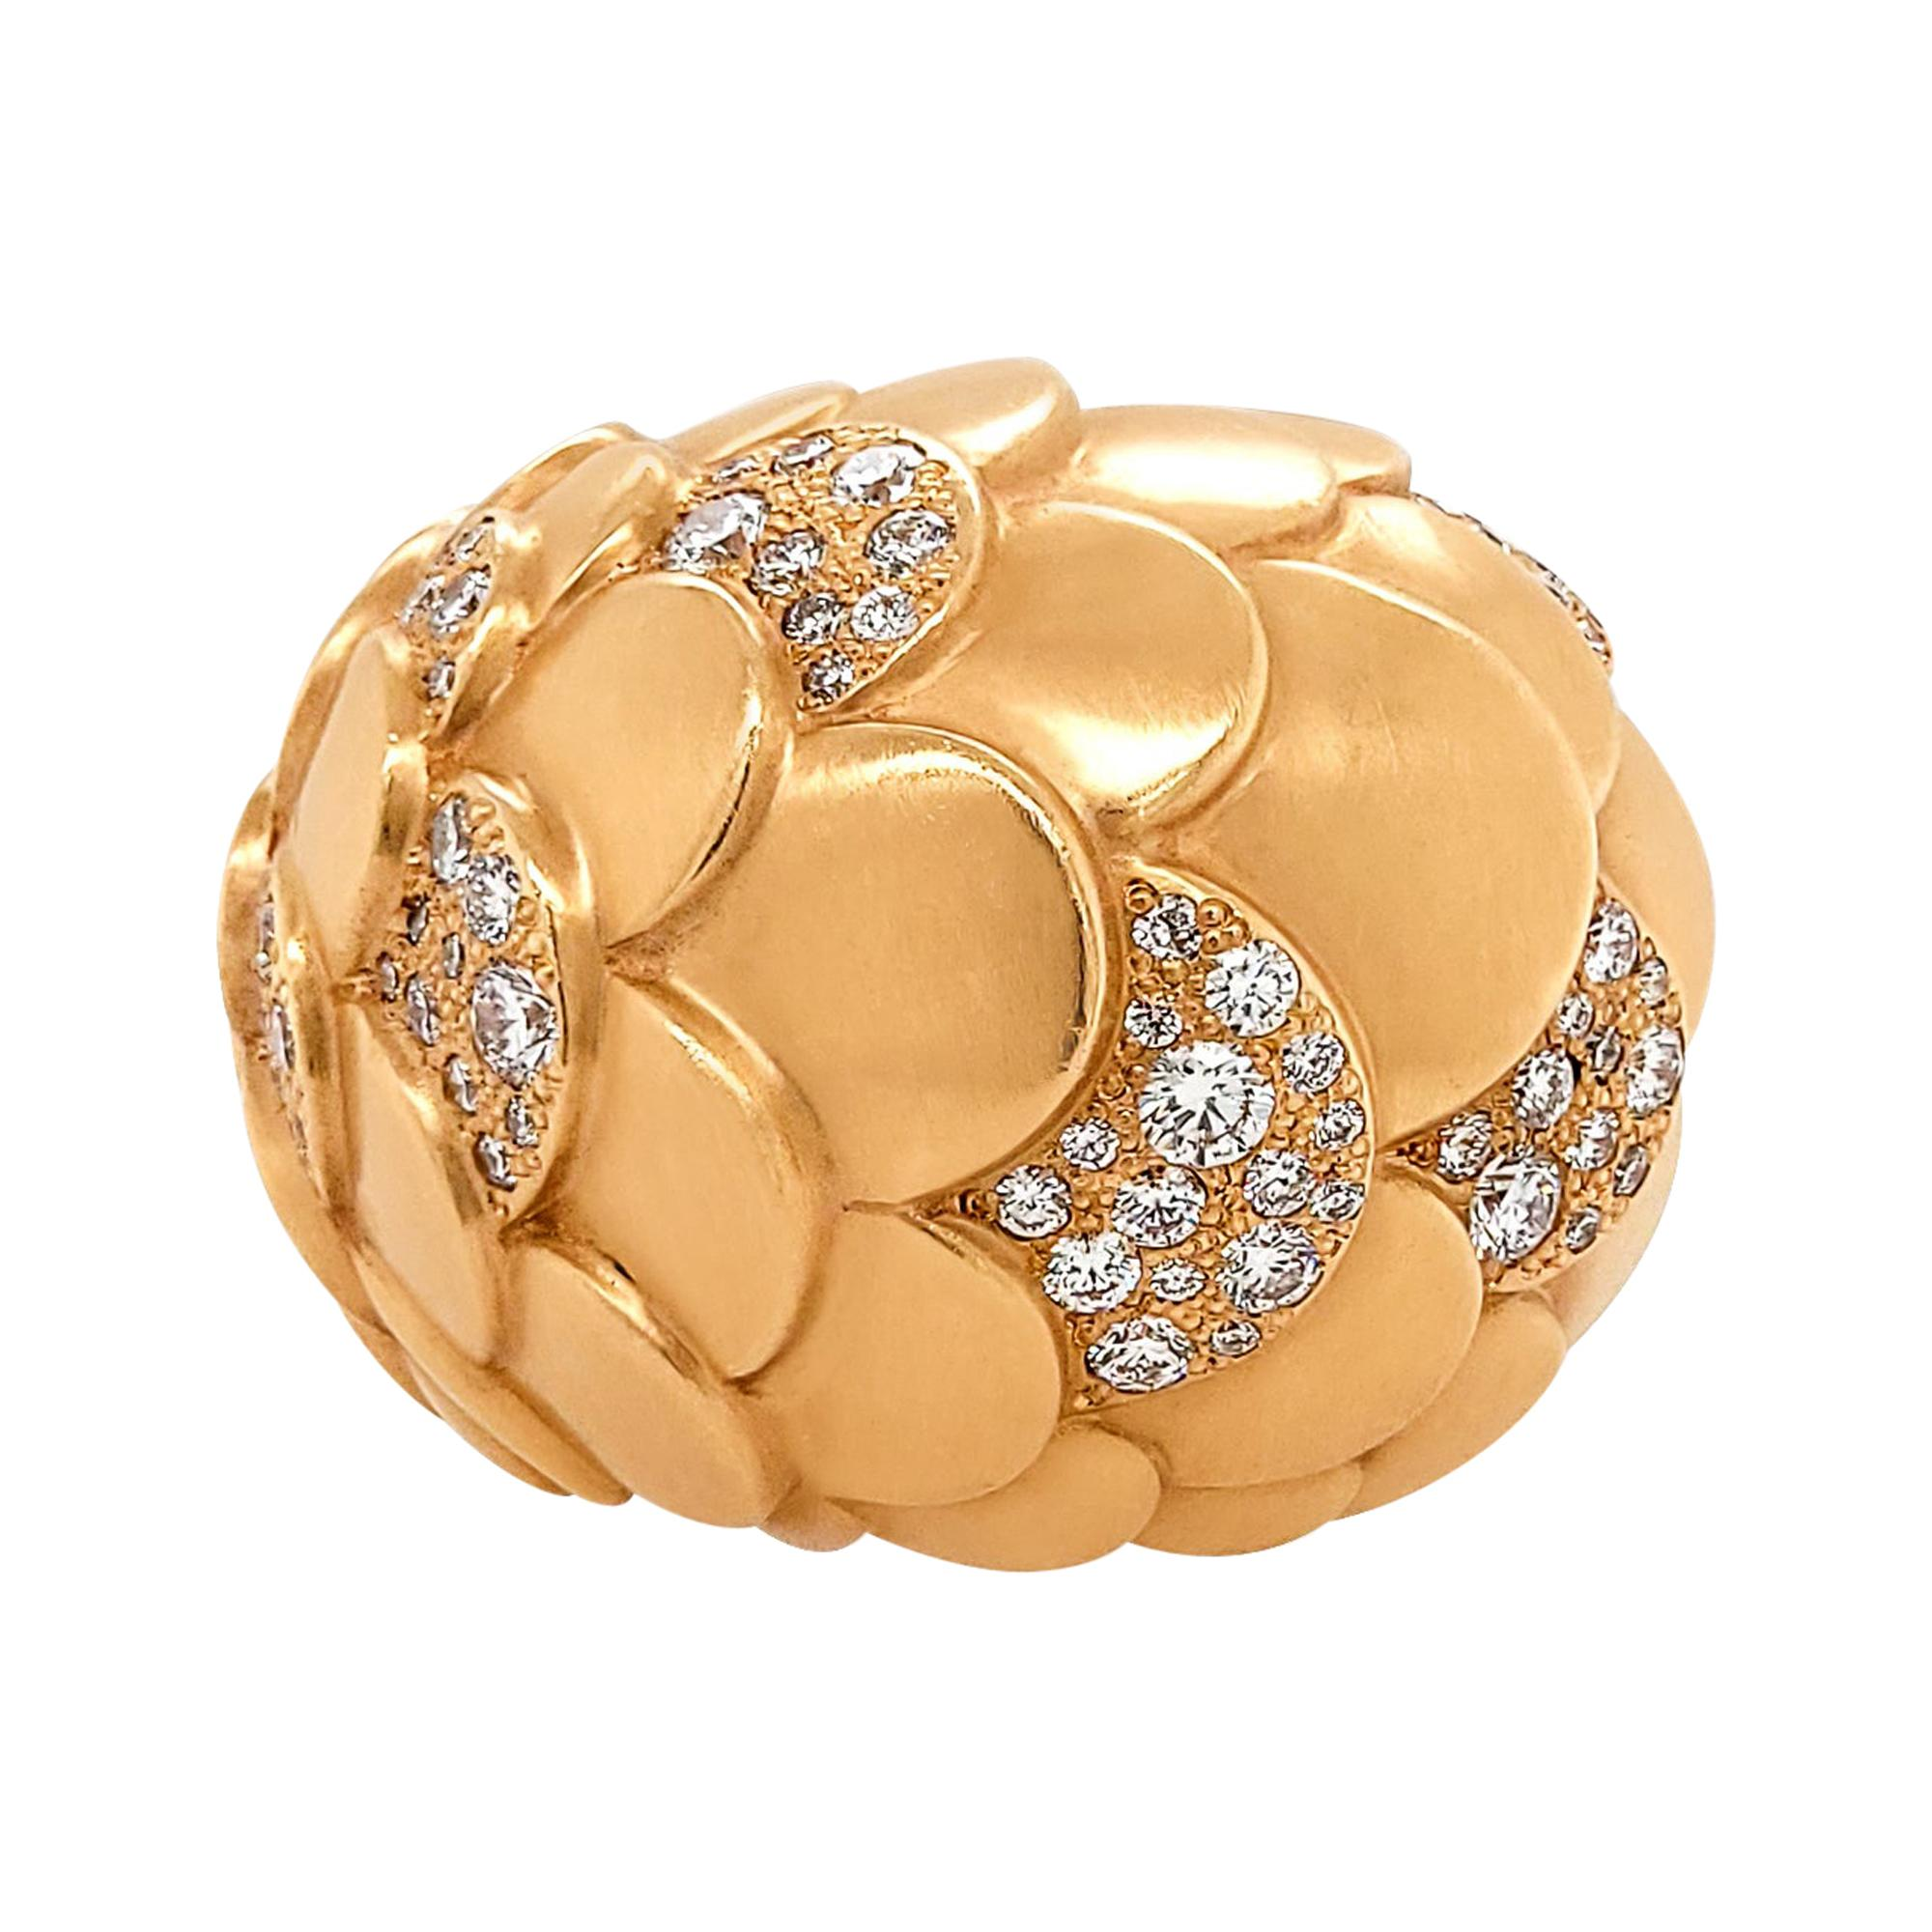 Pomellato Diamond Rose Gold Cocktail Ring